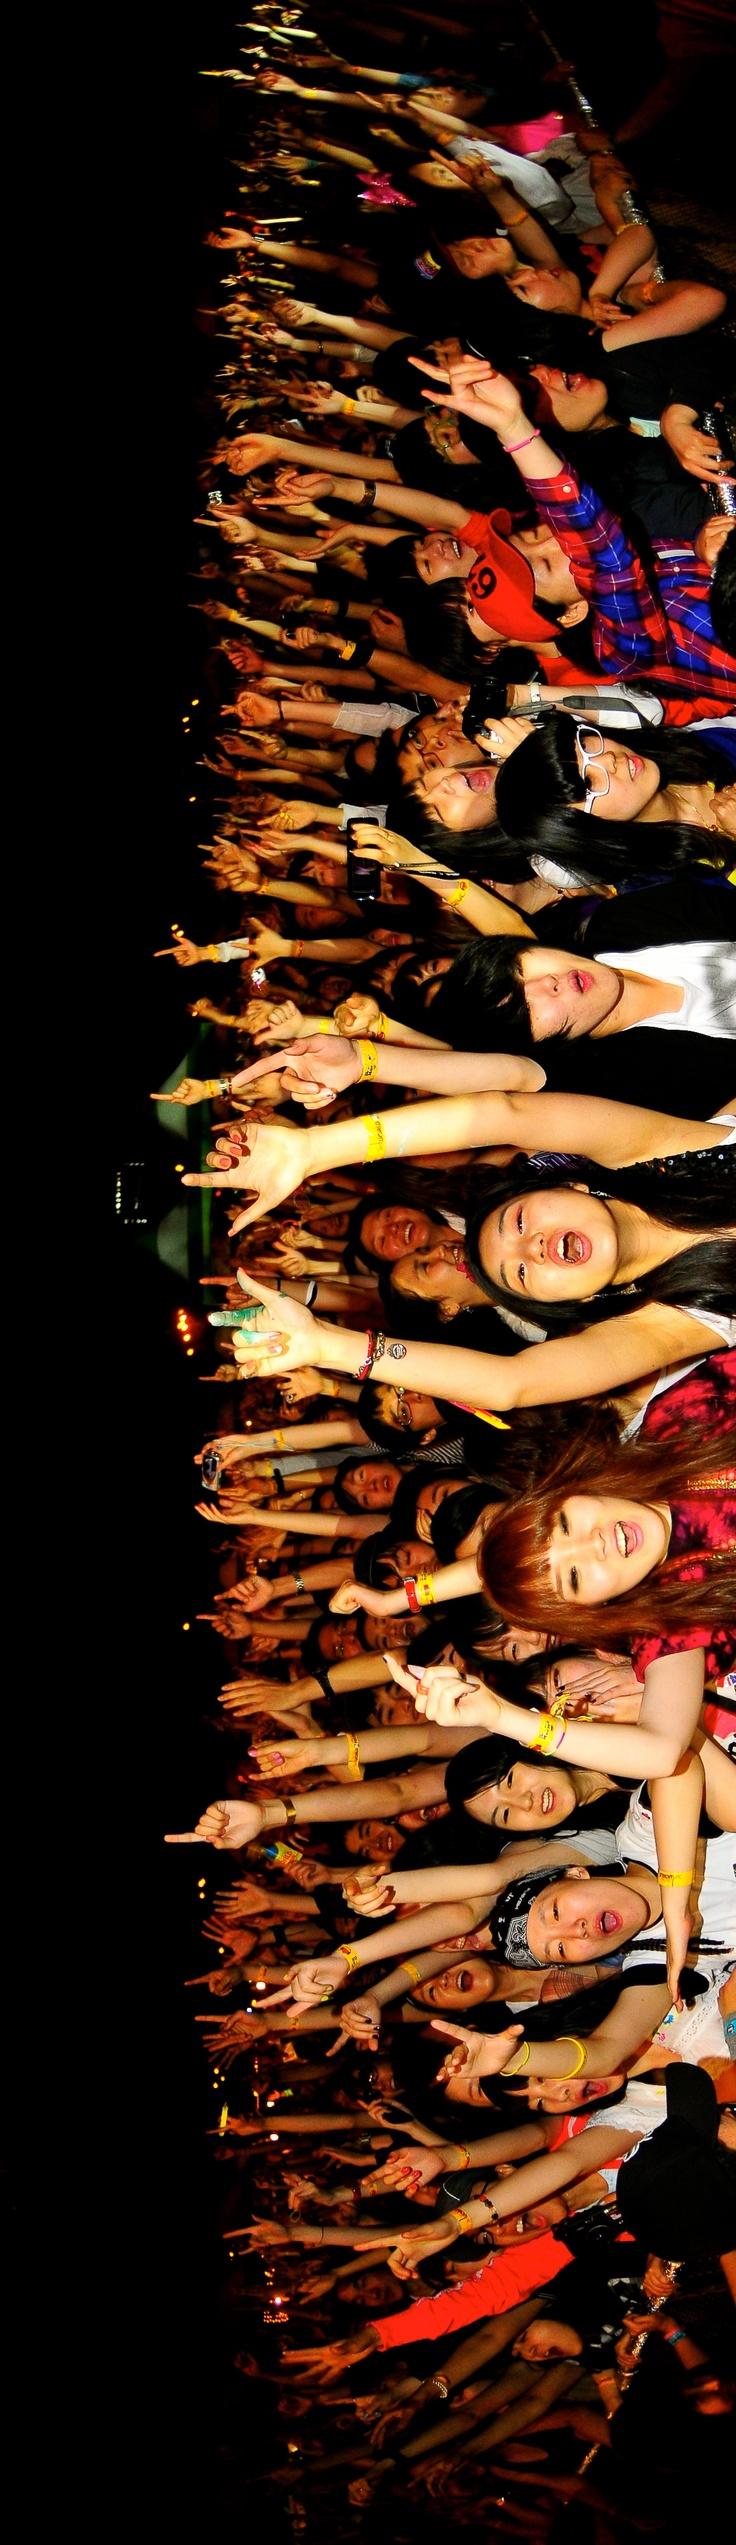 crazy night @World DJ Festival #EDM http://www.soundcloud.com/viralanimal